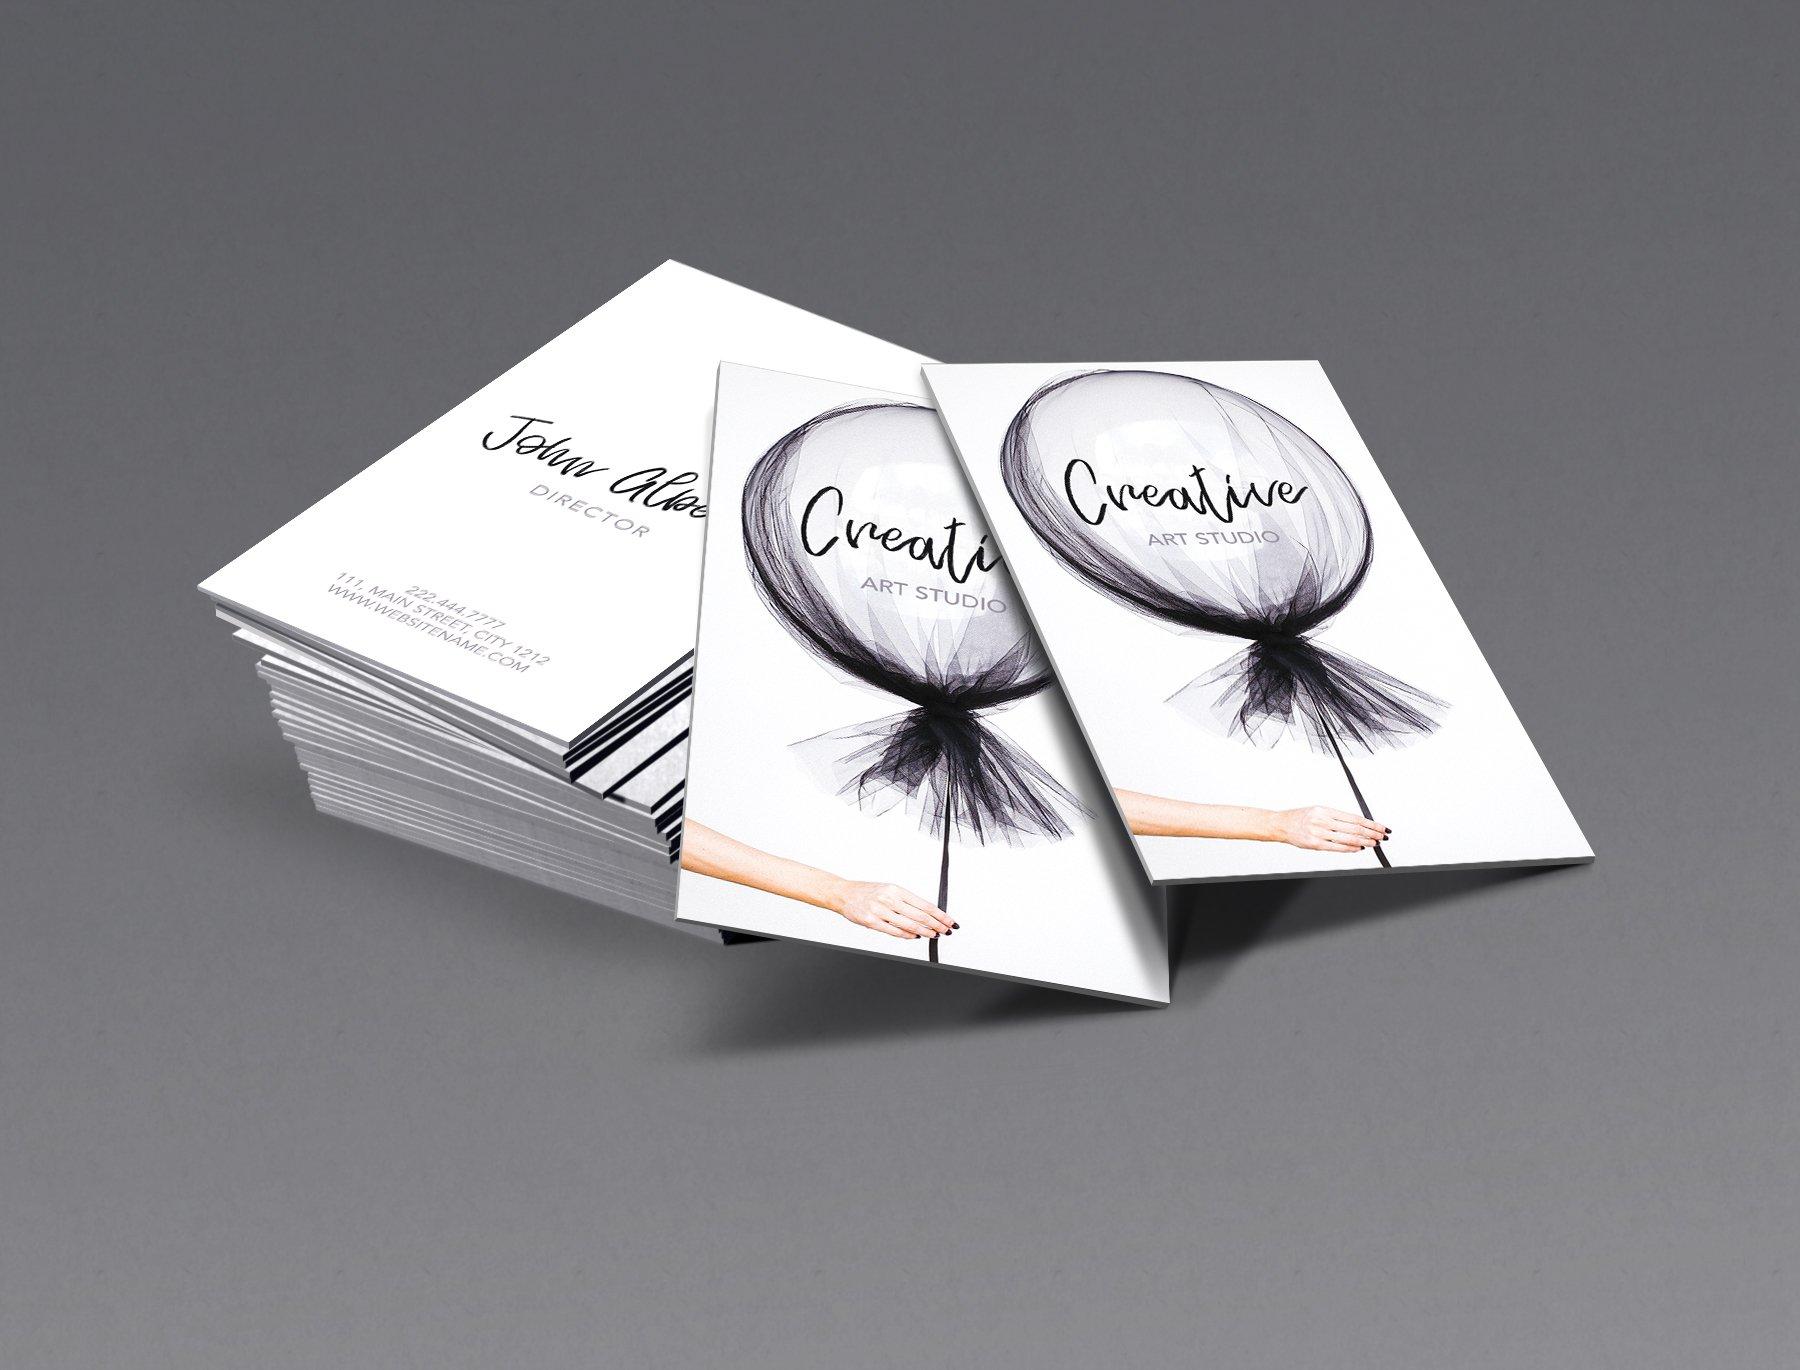 Music studio singer business card business card templates new fashion art business card colourmoves